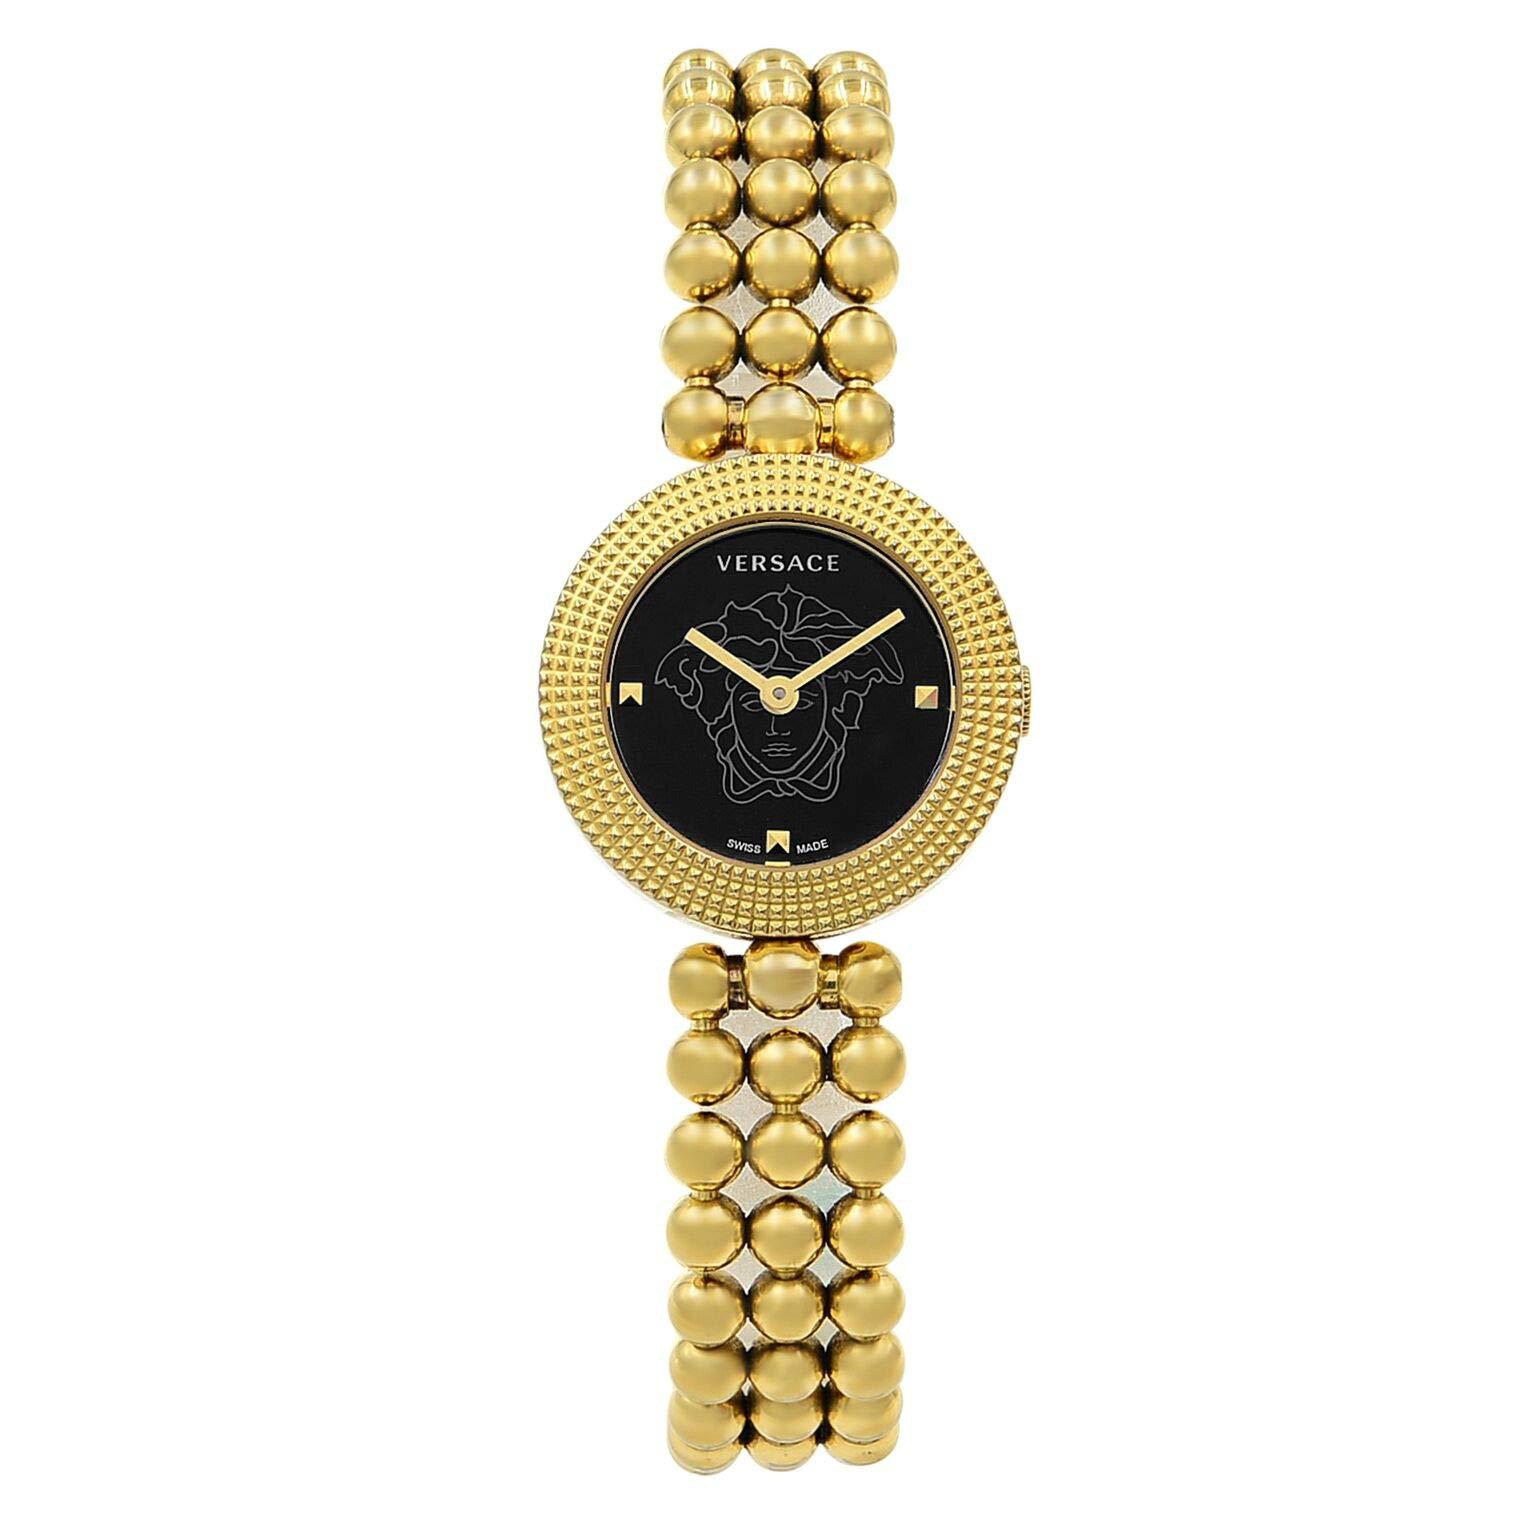 Versace Eon Quartz Female Watch 94Q80D008 S080 (Certified Pre-Owned) by Versace